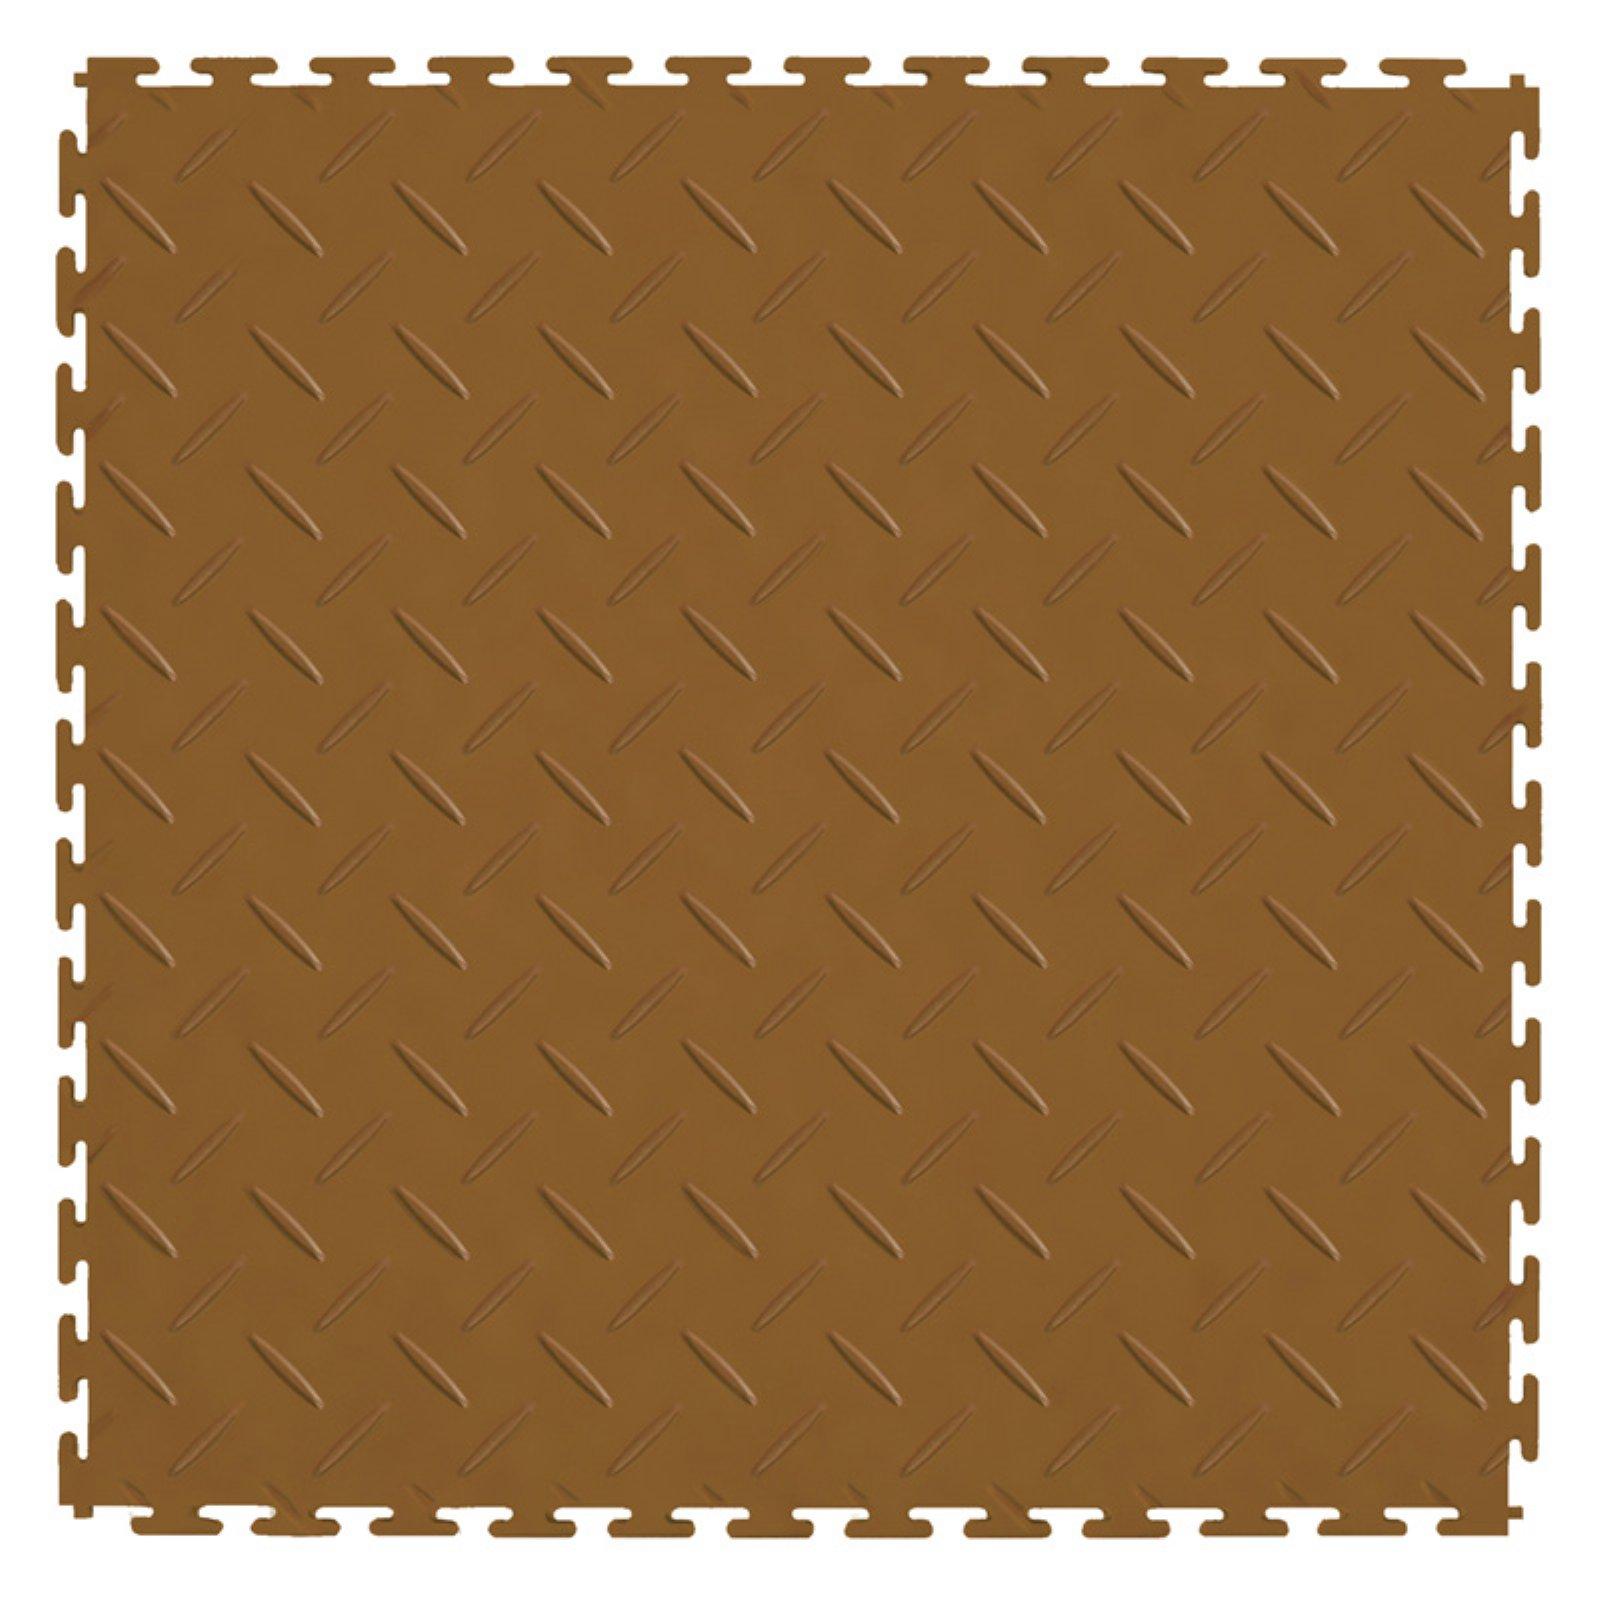 Perfection Floor Tile Diamond Plate PVC Interlocking Tiles - 8 pk.